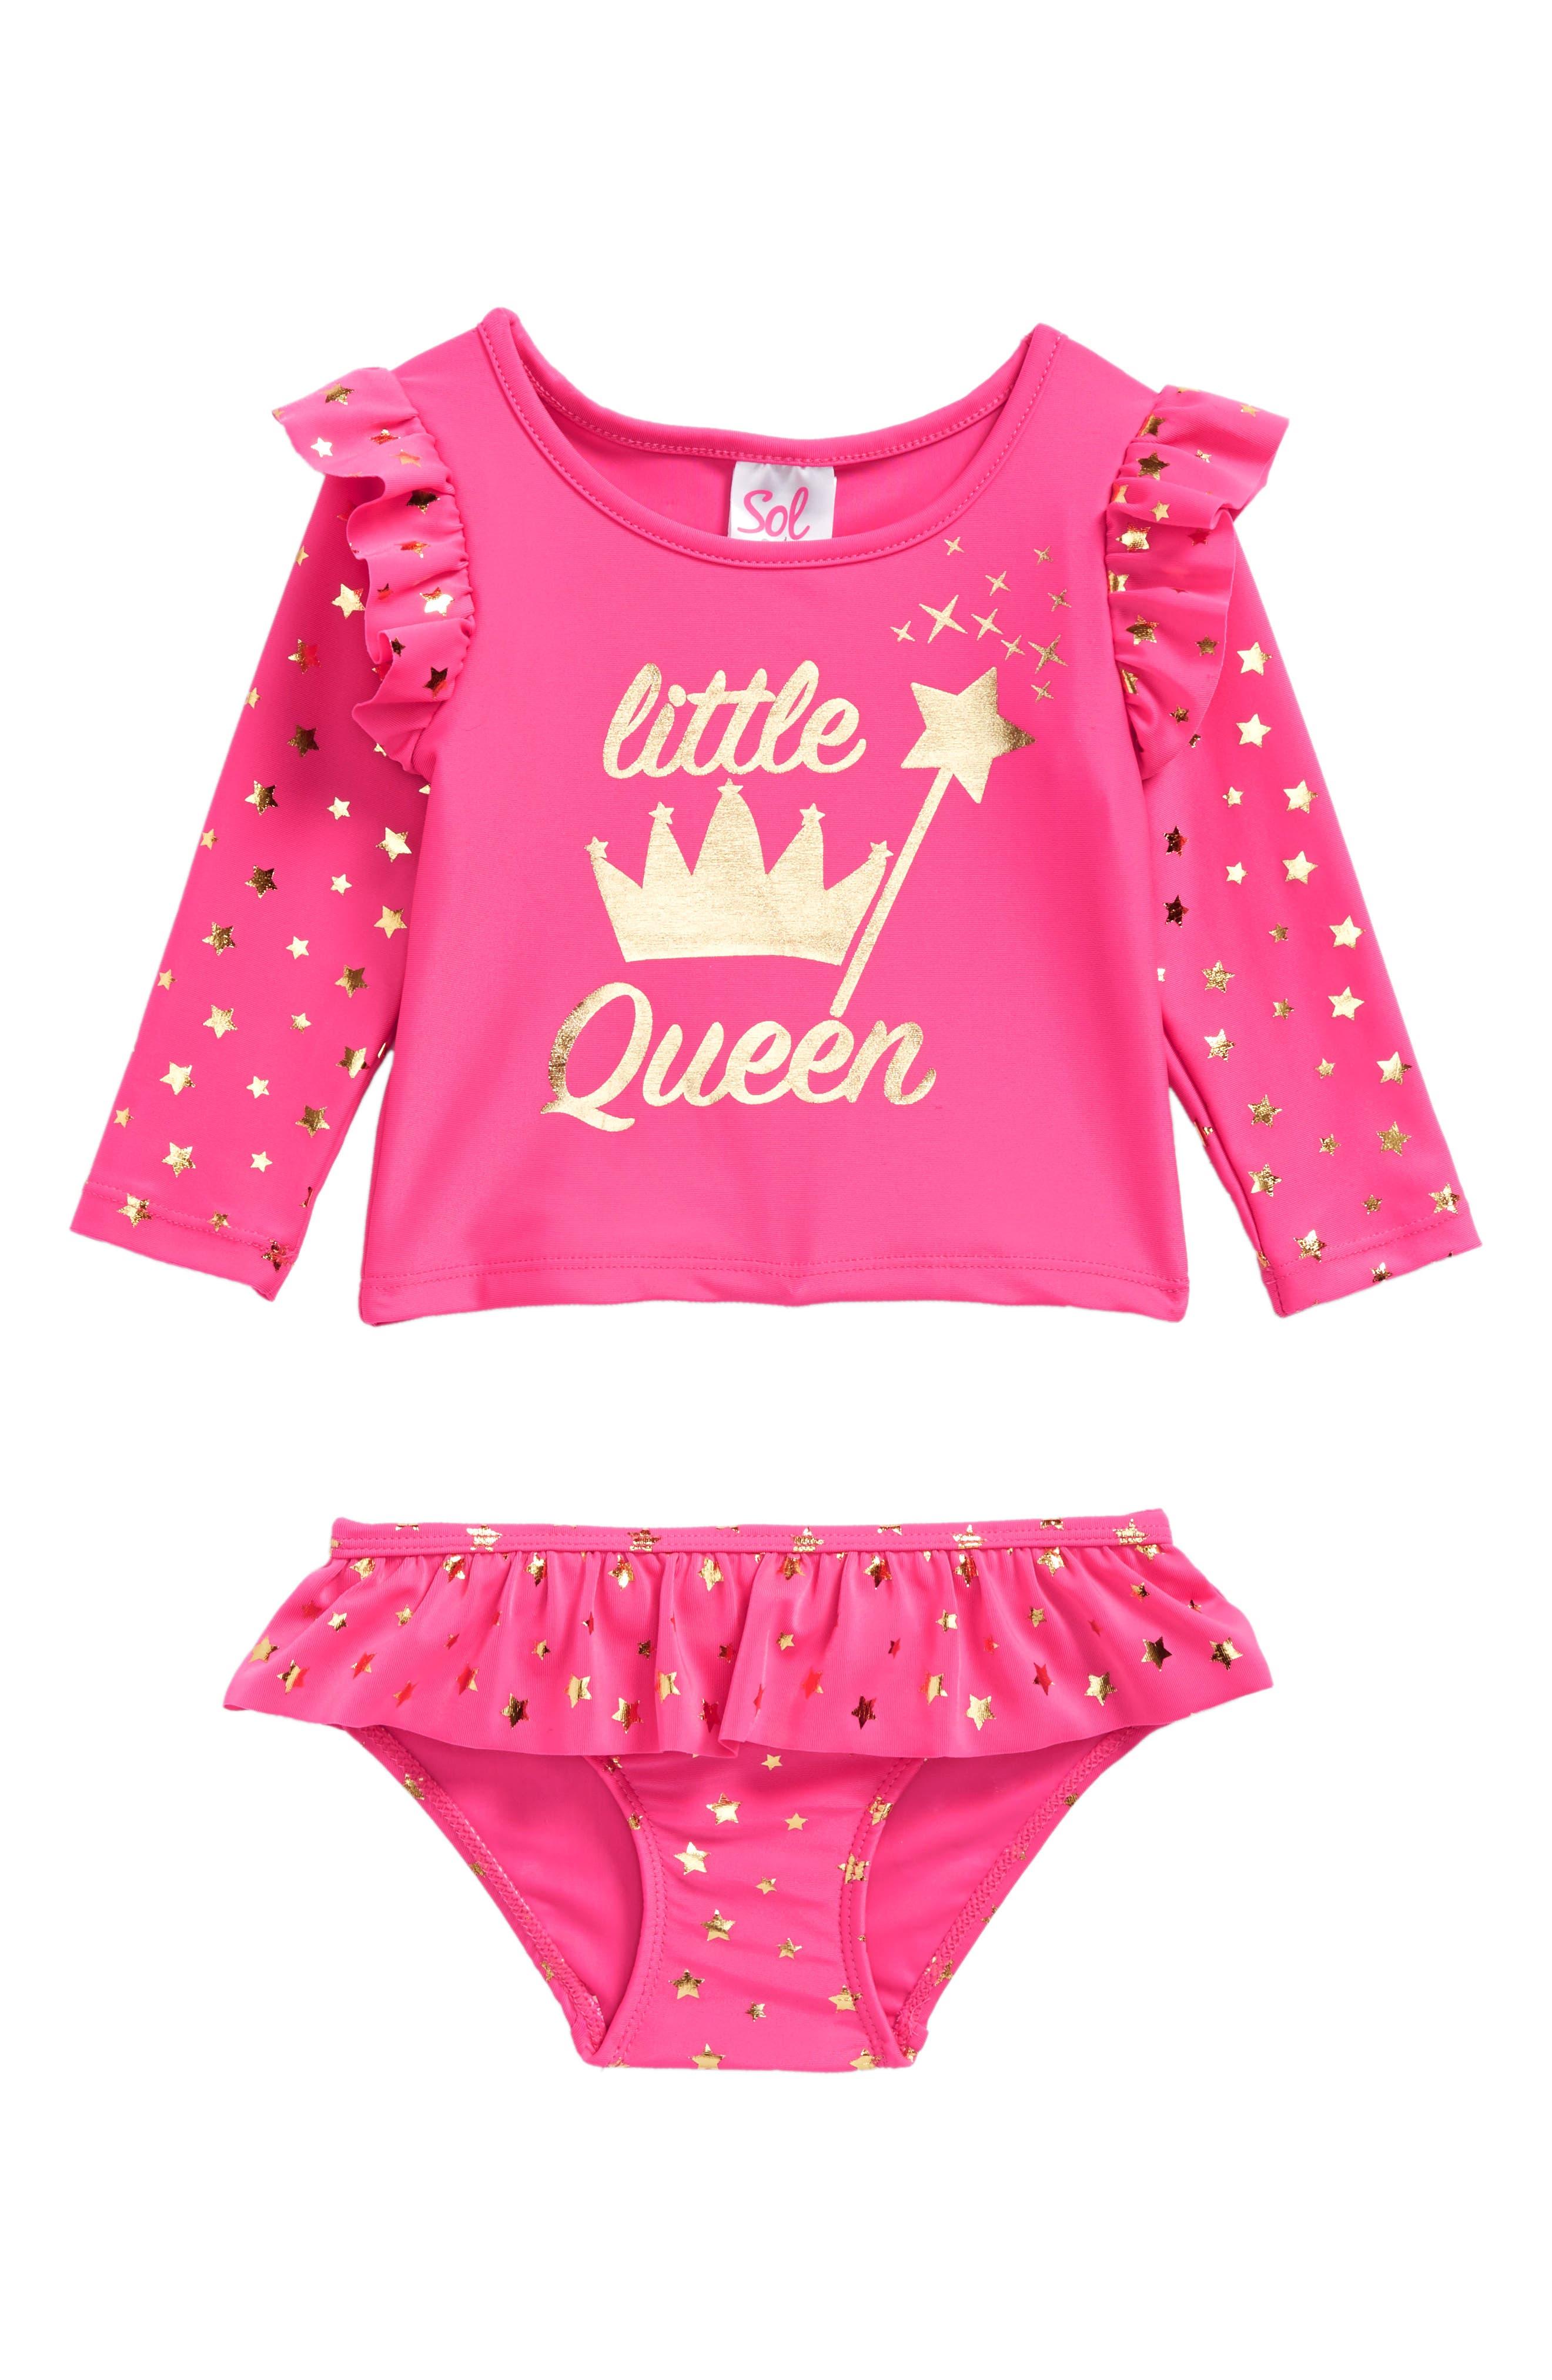 Little Queen Two-Piece Rashguard Swimsuit,                             Main thumbnail 1, color,                             Fuchsia